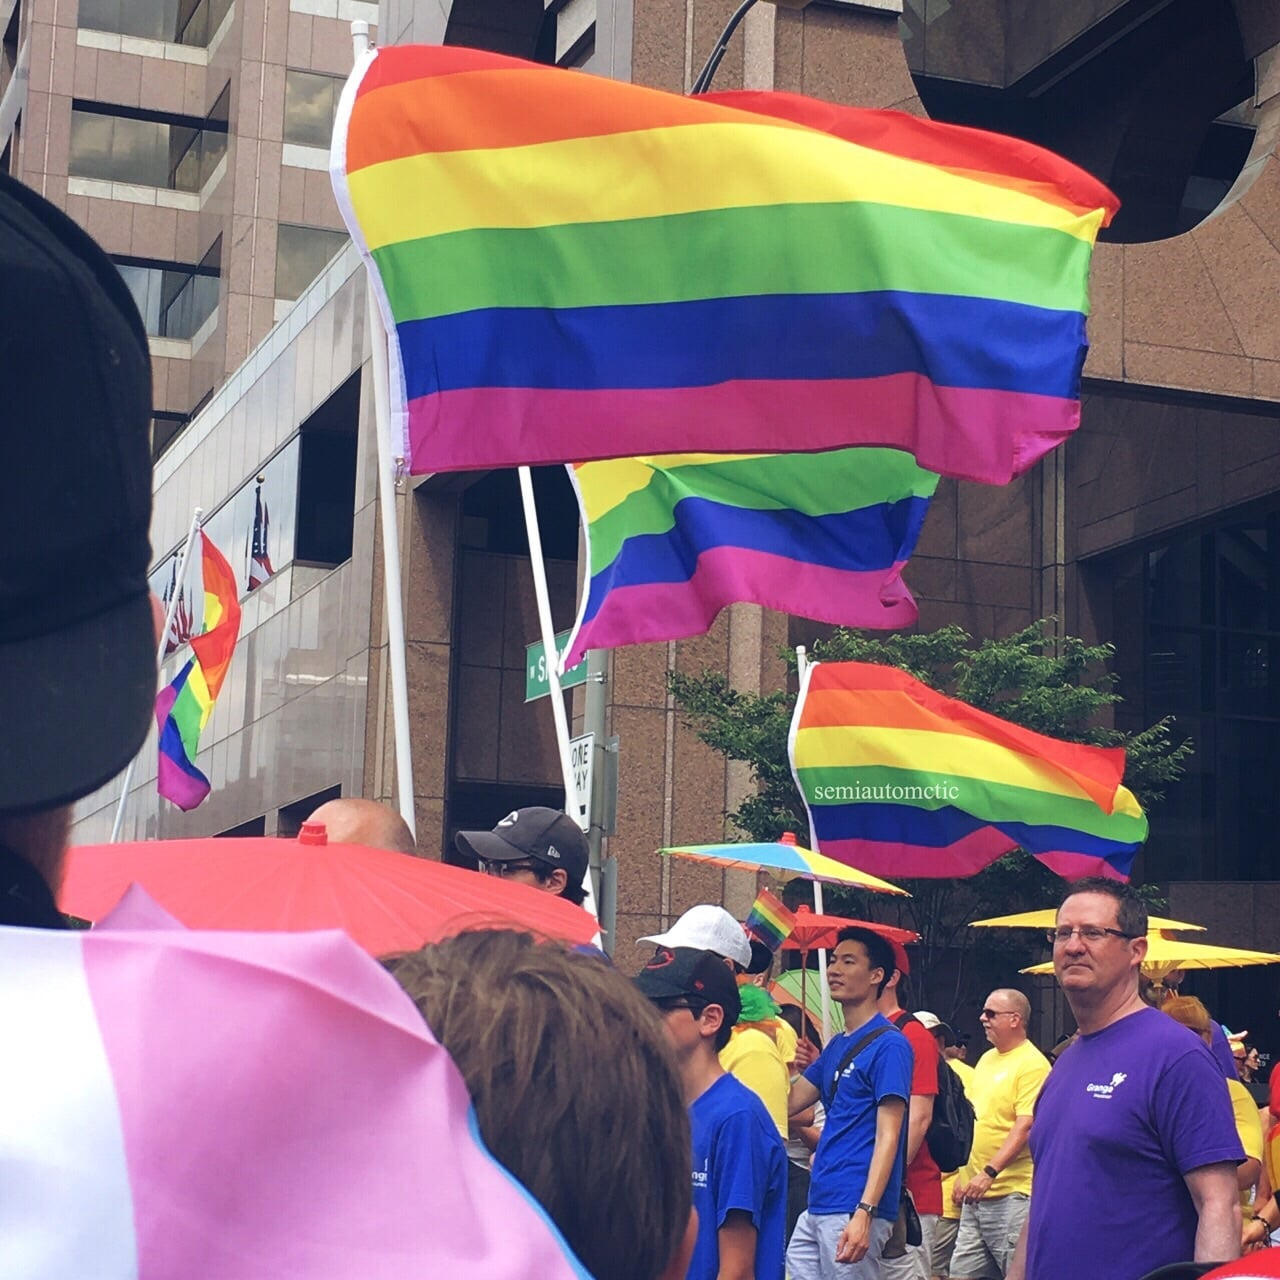 Disney trading pin rainbow gay pride lgbtq mickey ears head souvenir colors